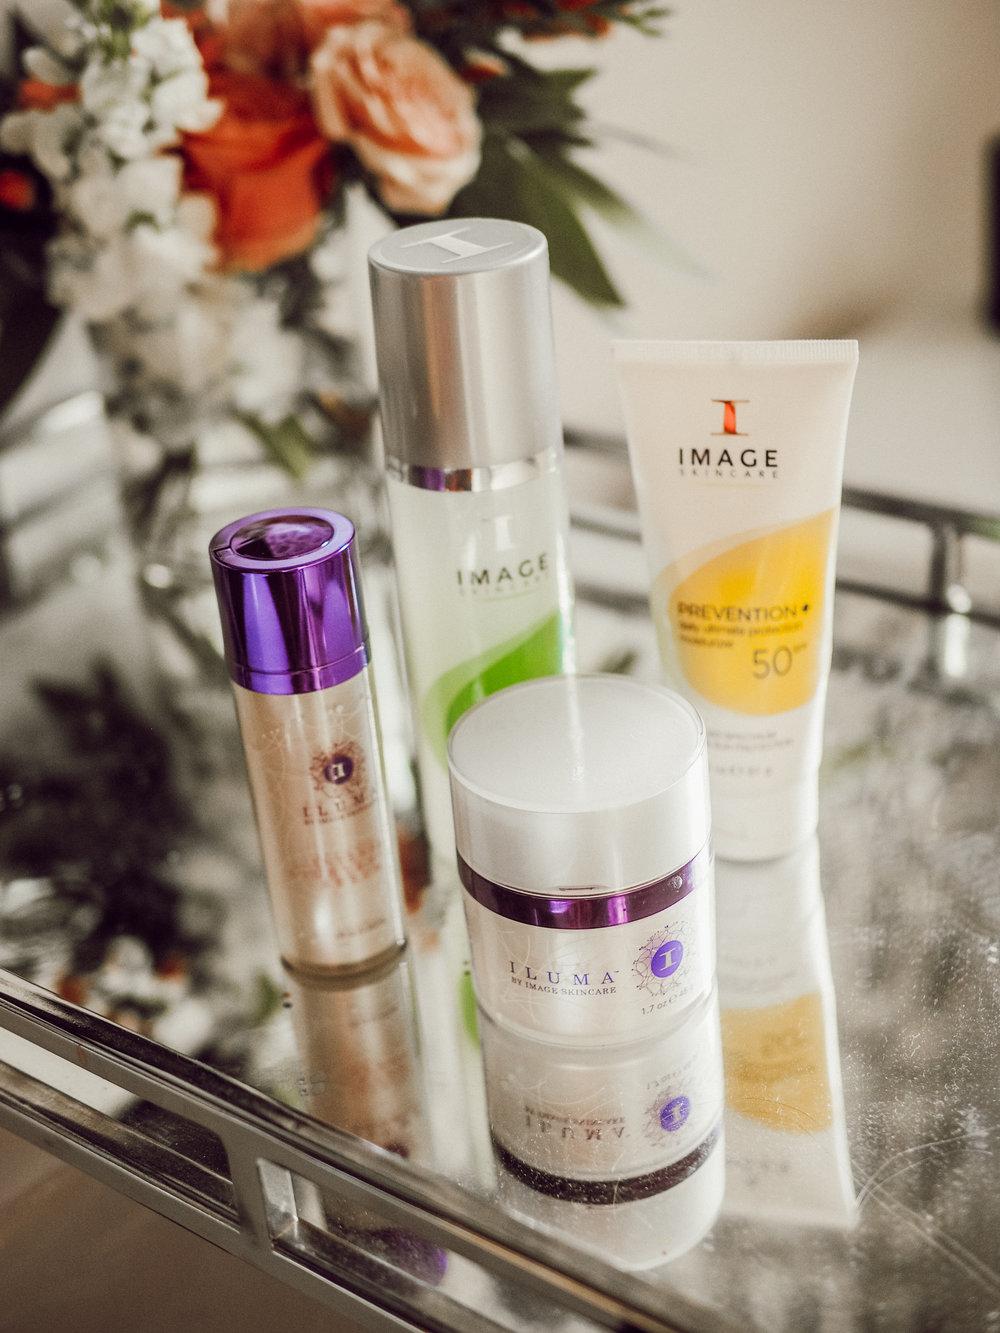 image skincare routine